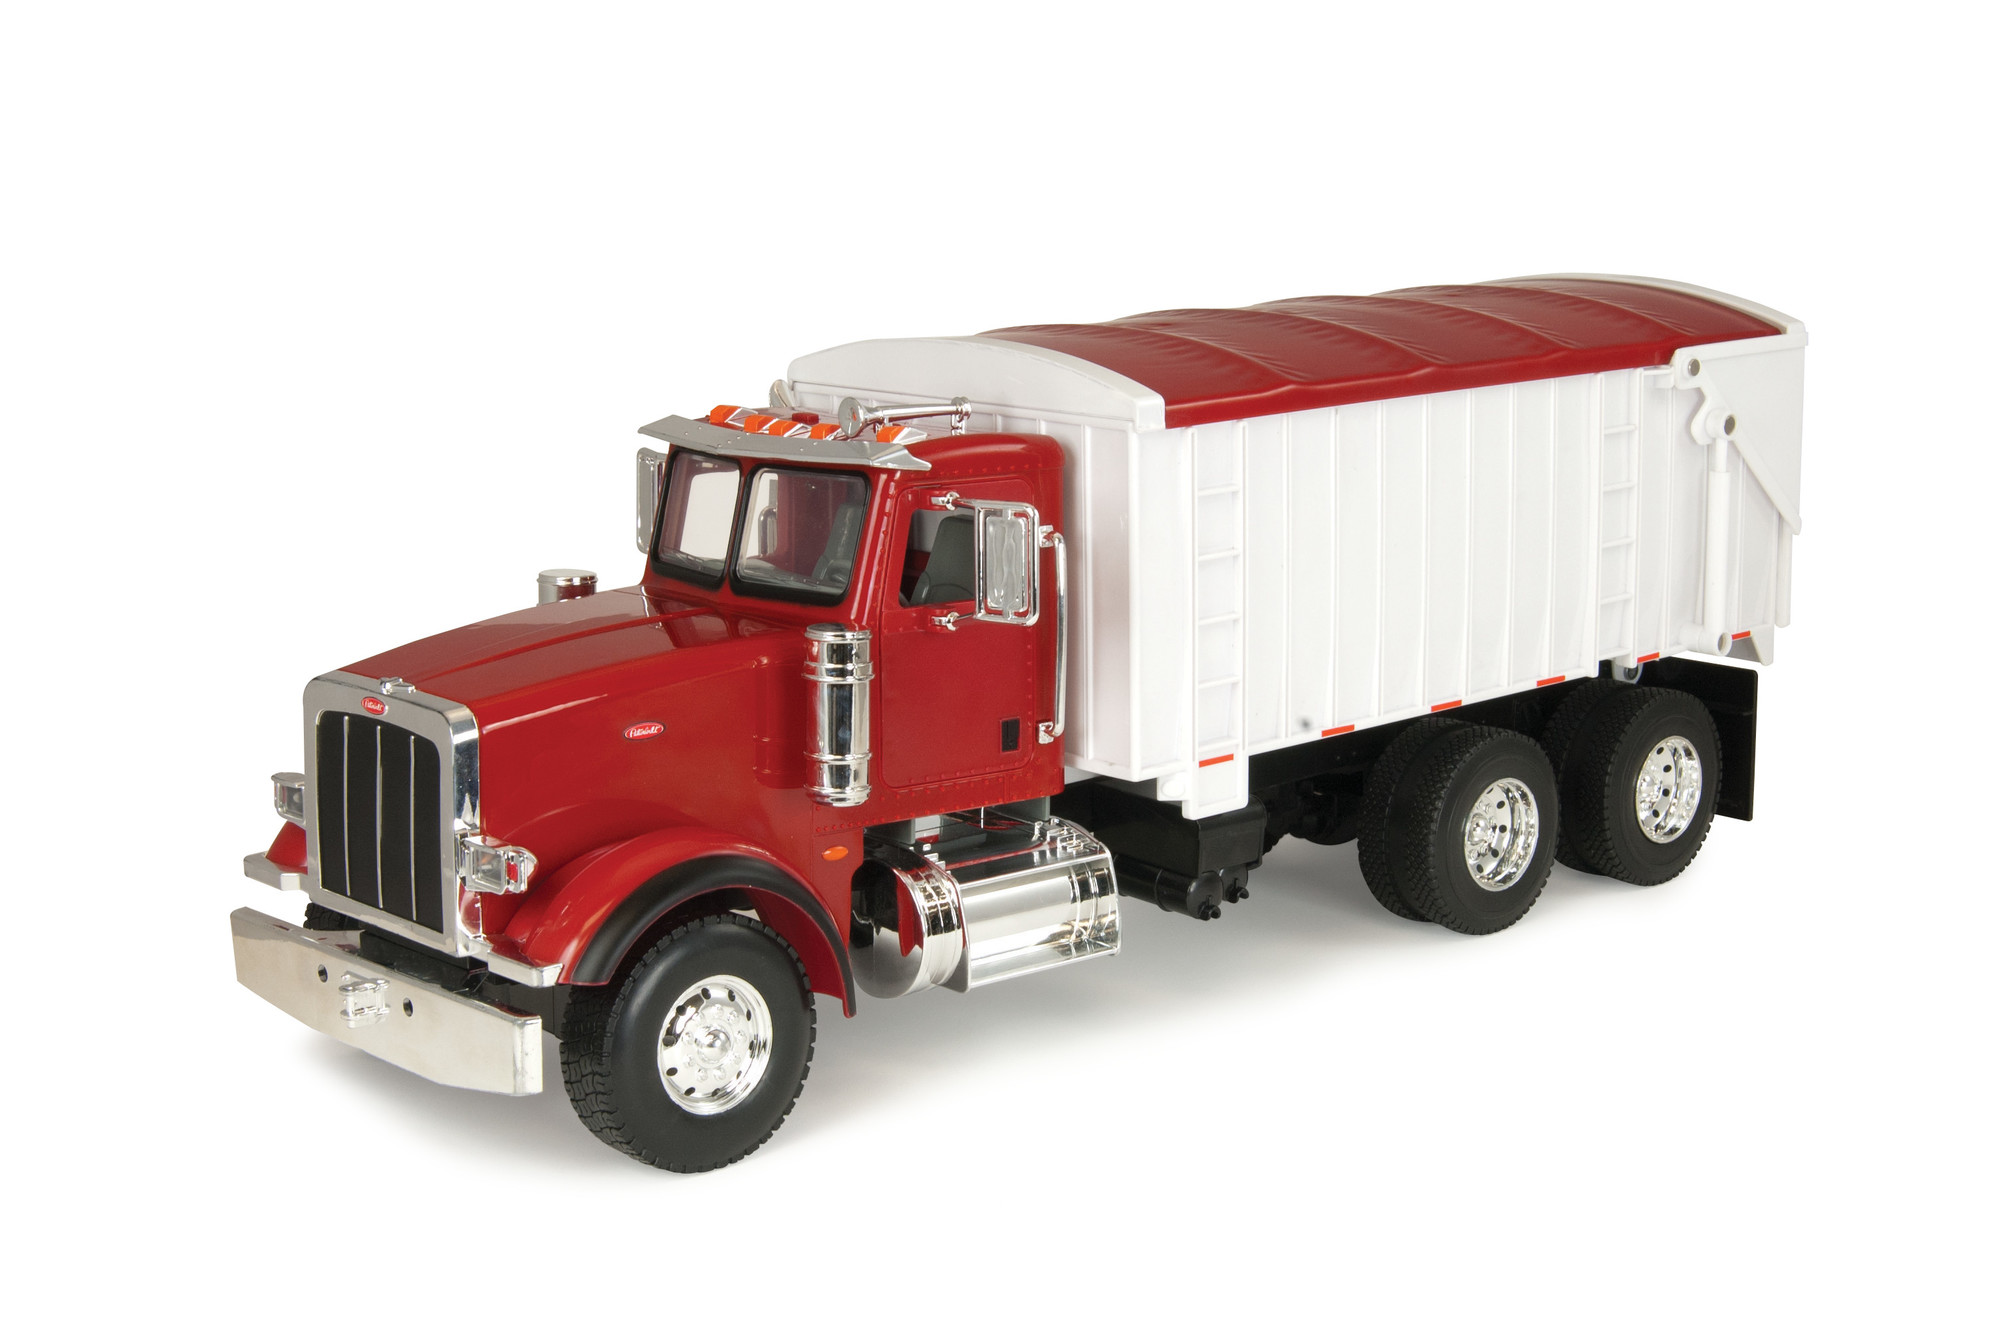 John Deere 1:16 Peterbilt Big Farm Grain Truck by Tomy Inc